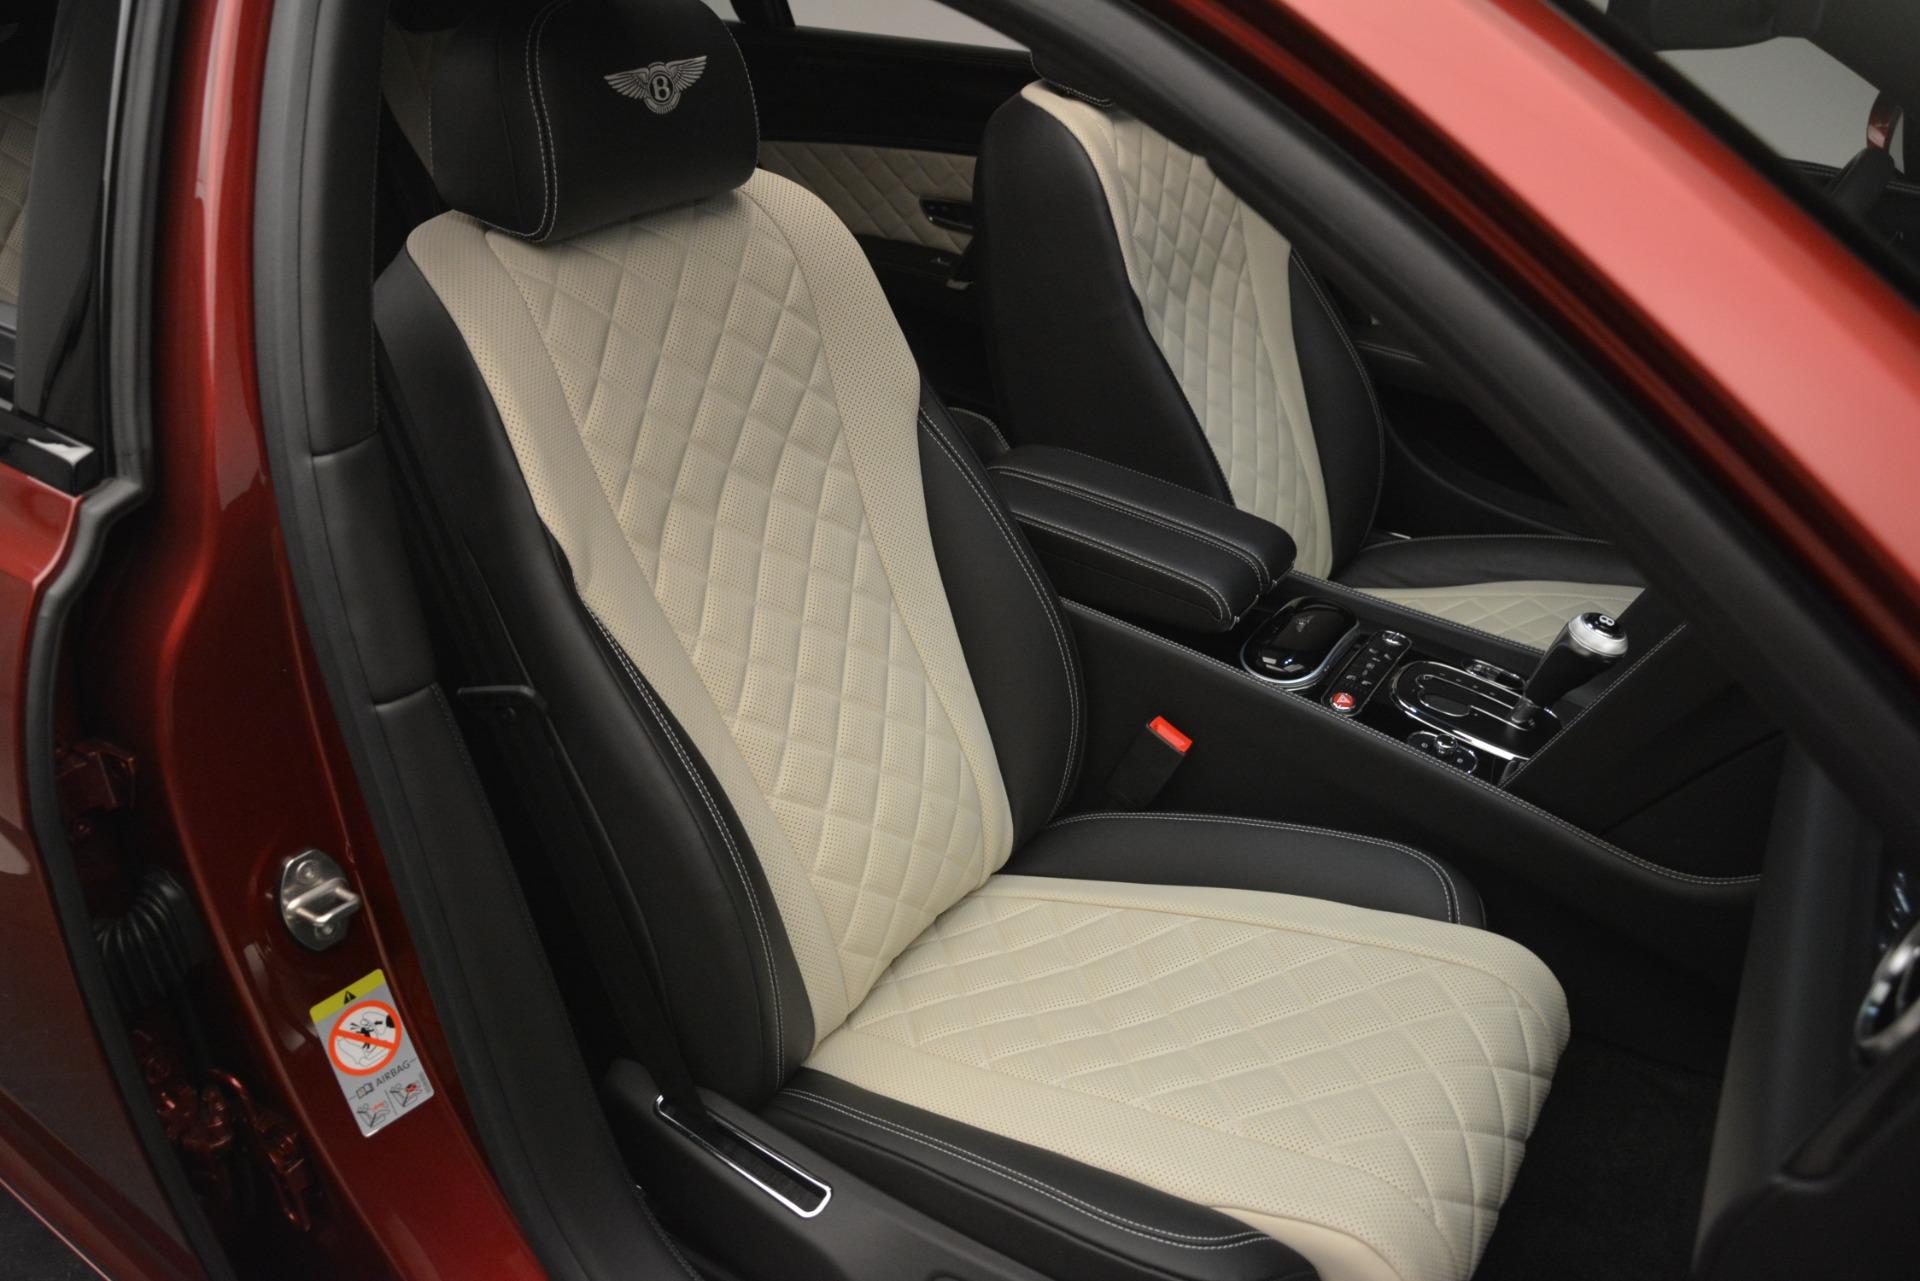 Used 2018 Bentley Flying Spur W12 S For Sale In Westport, CT 3014_p27